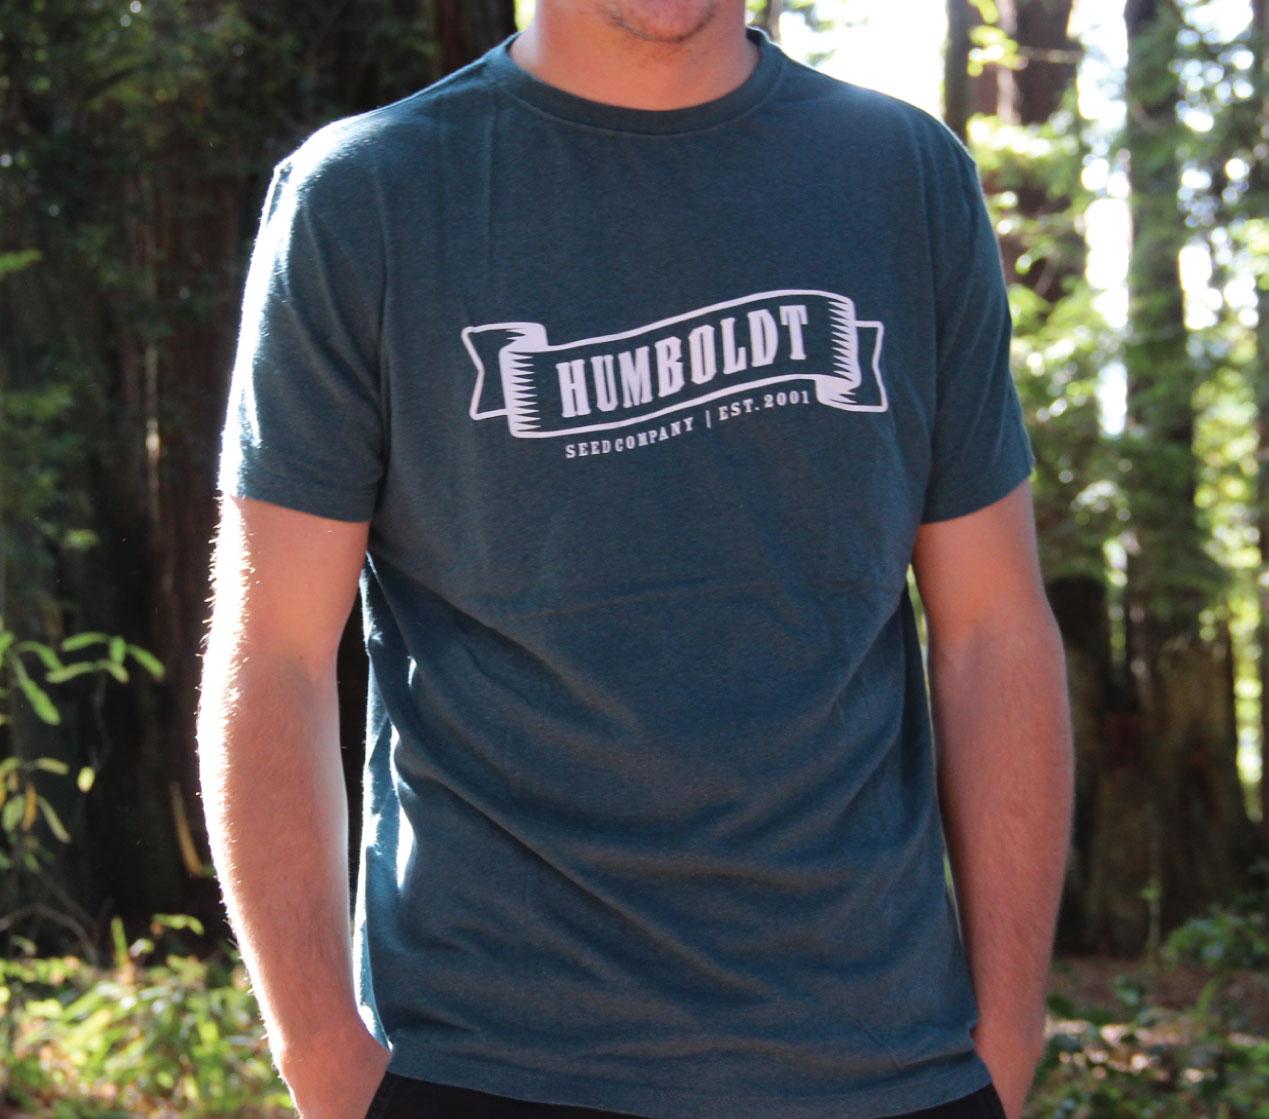 Humboldt Seed Company Apparel